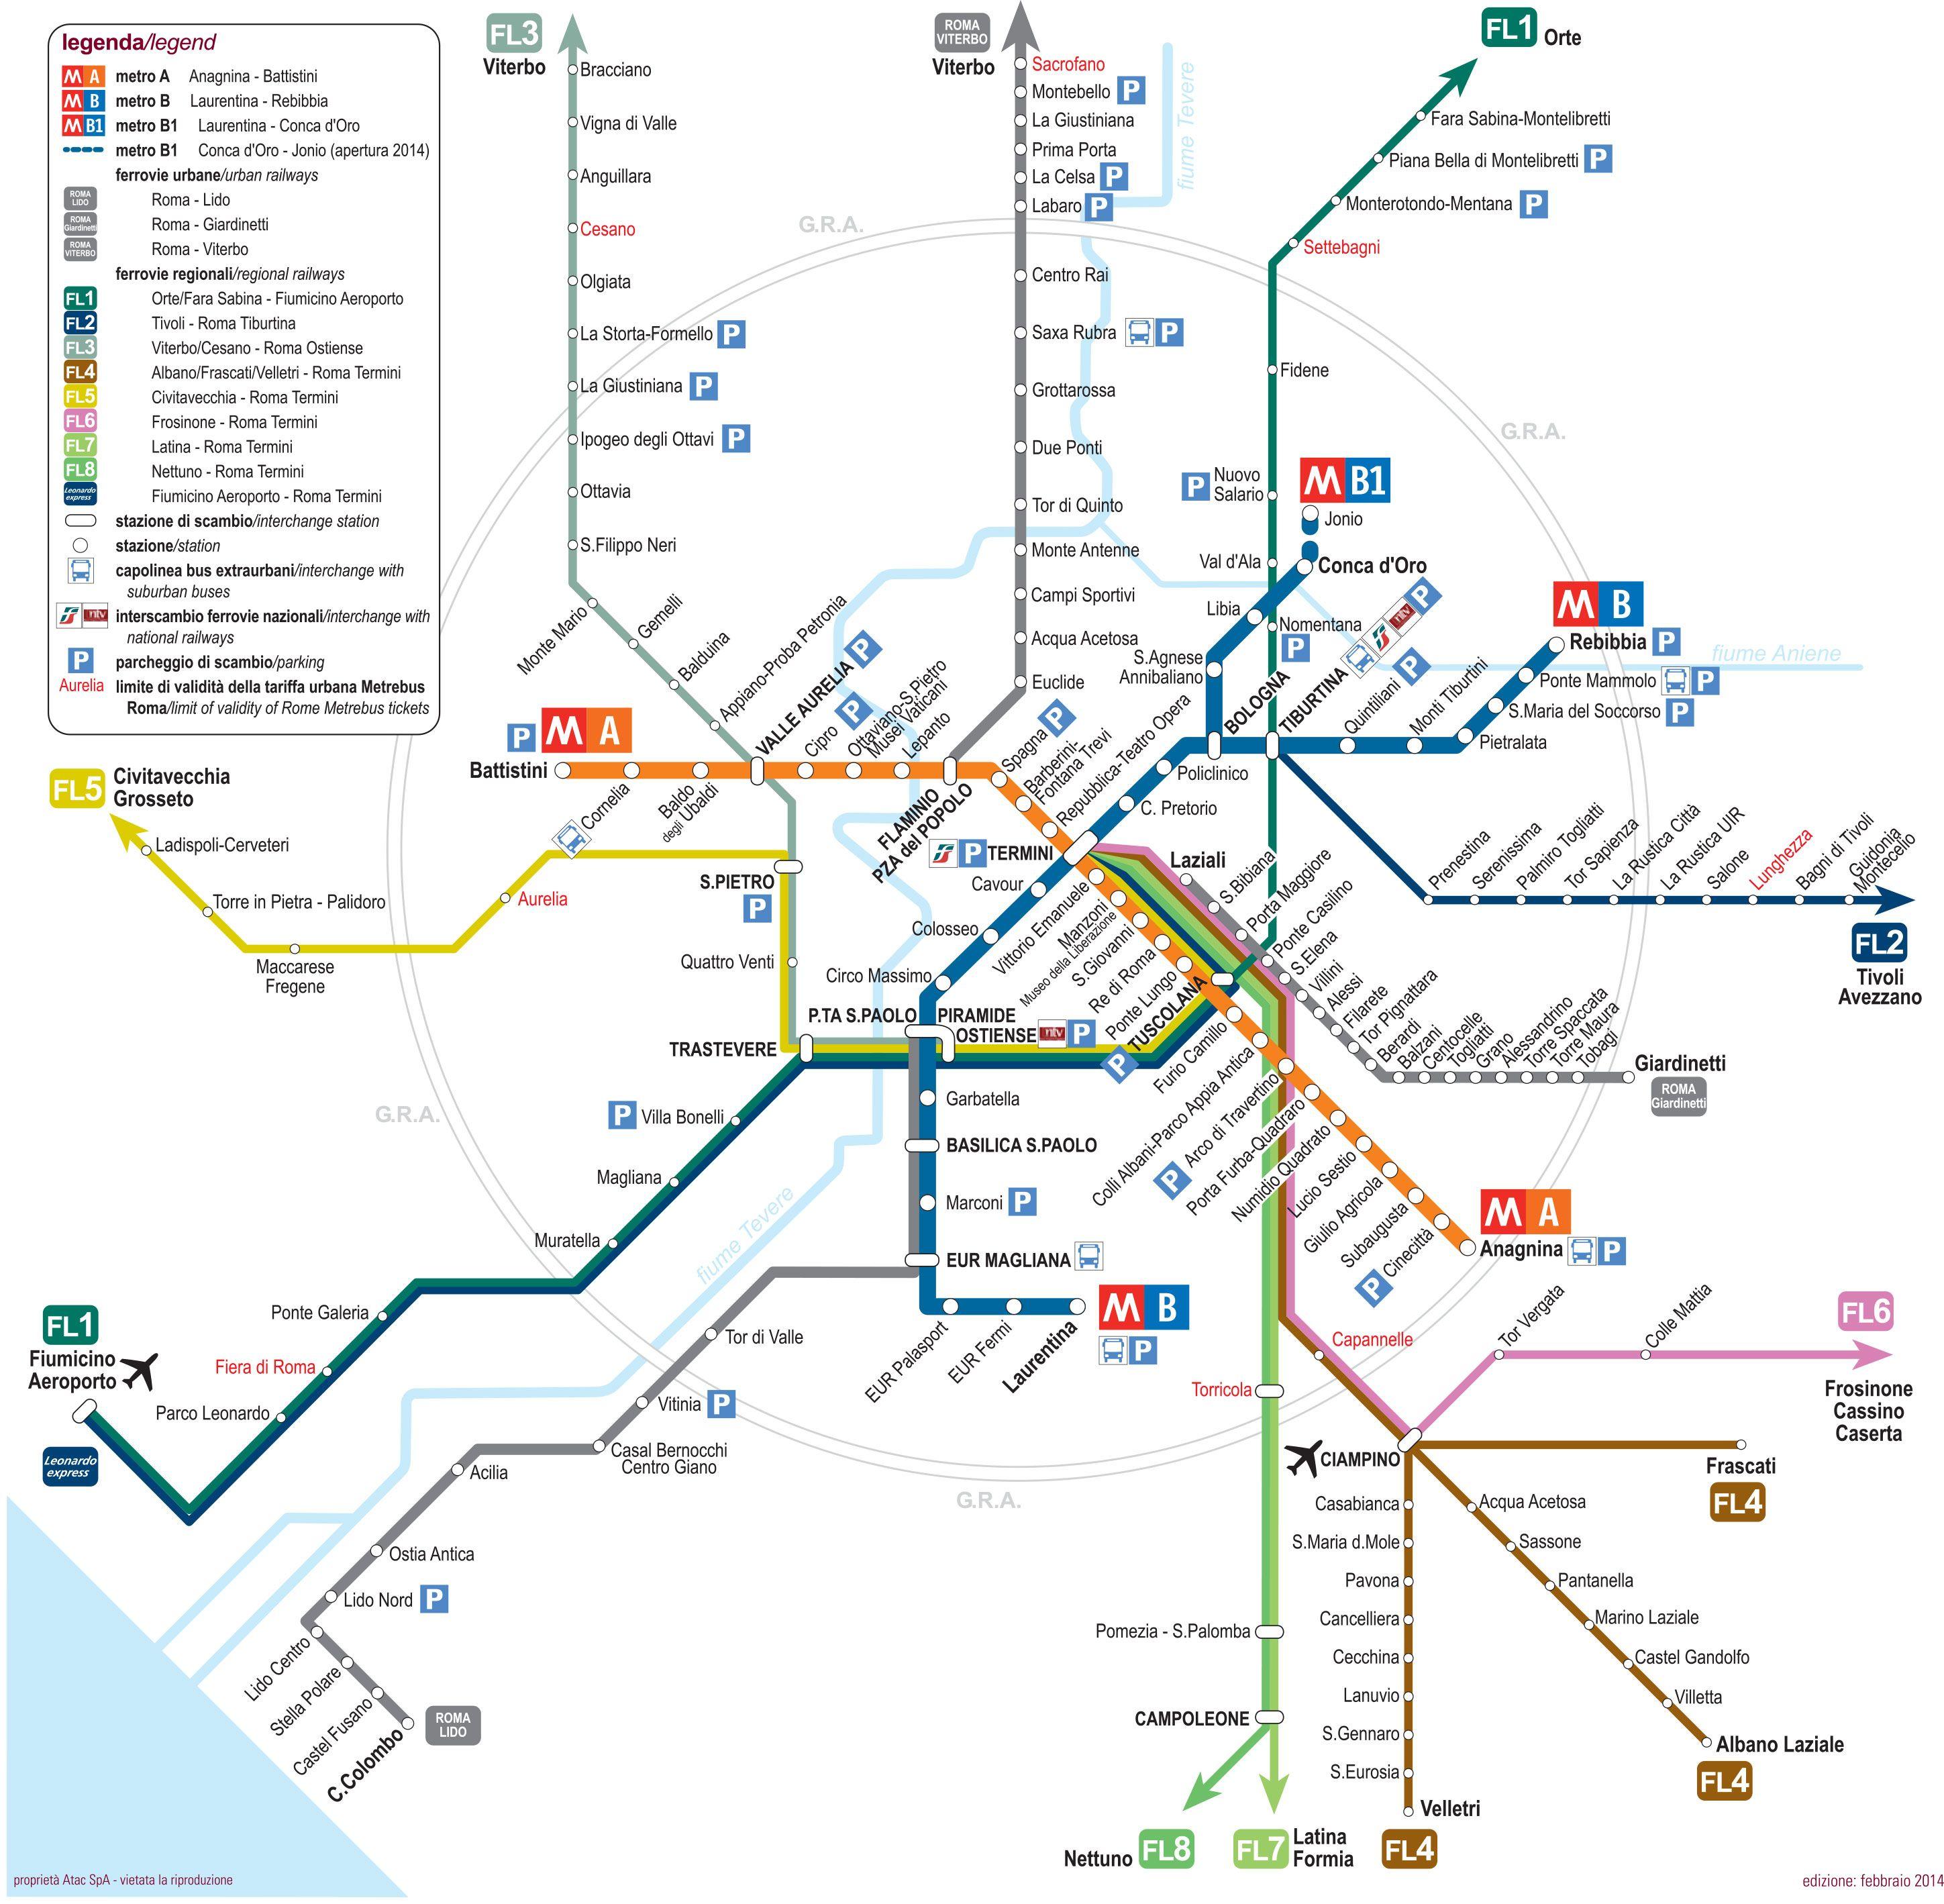 Map Of Rome Train Urban Commuter Suburban Railway Network Http - Sweden tunnelbana map